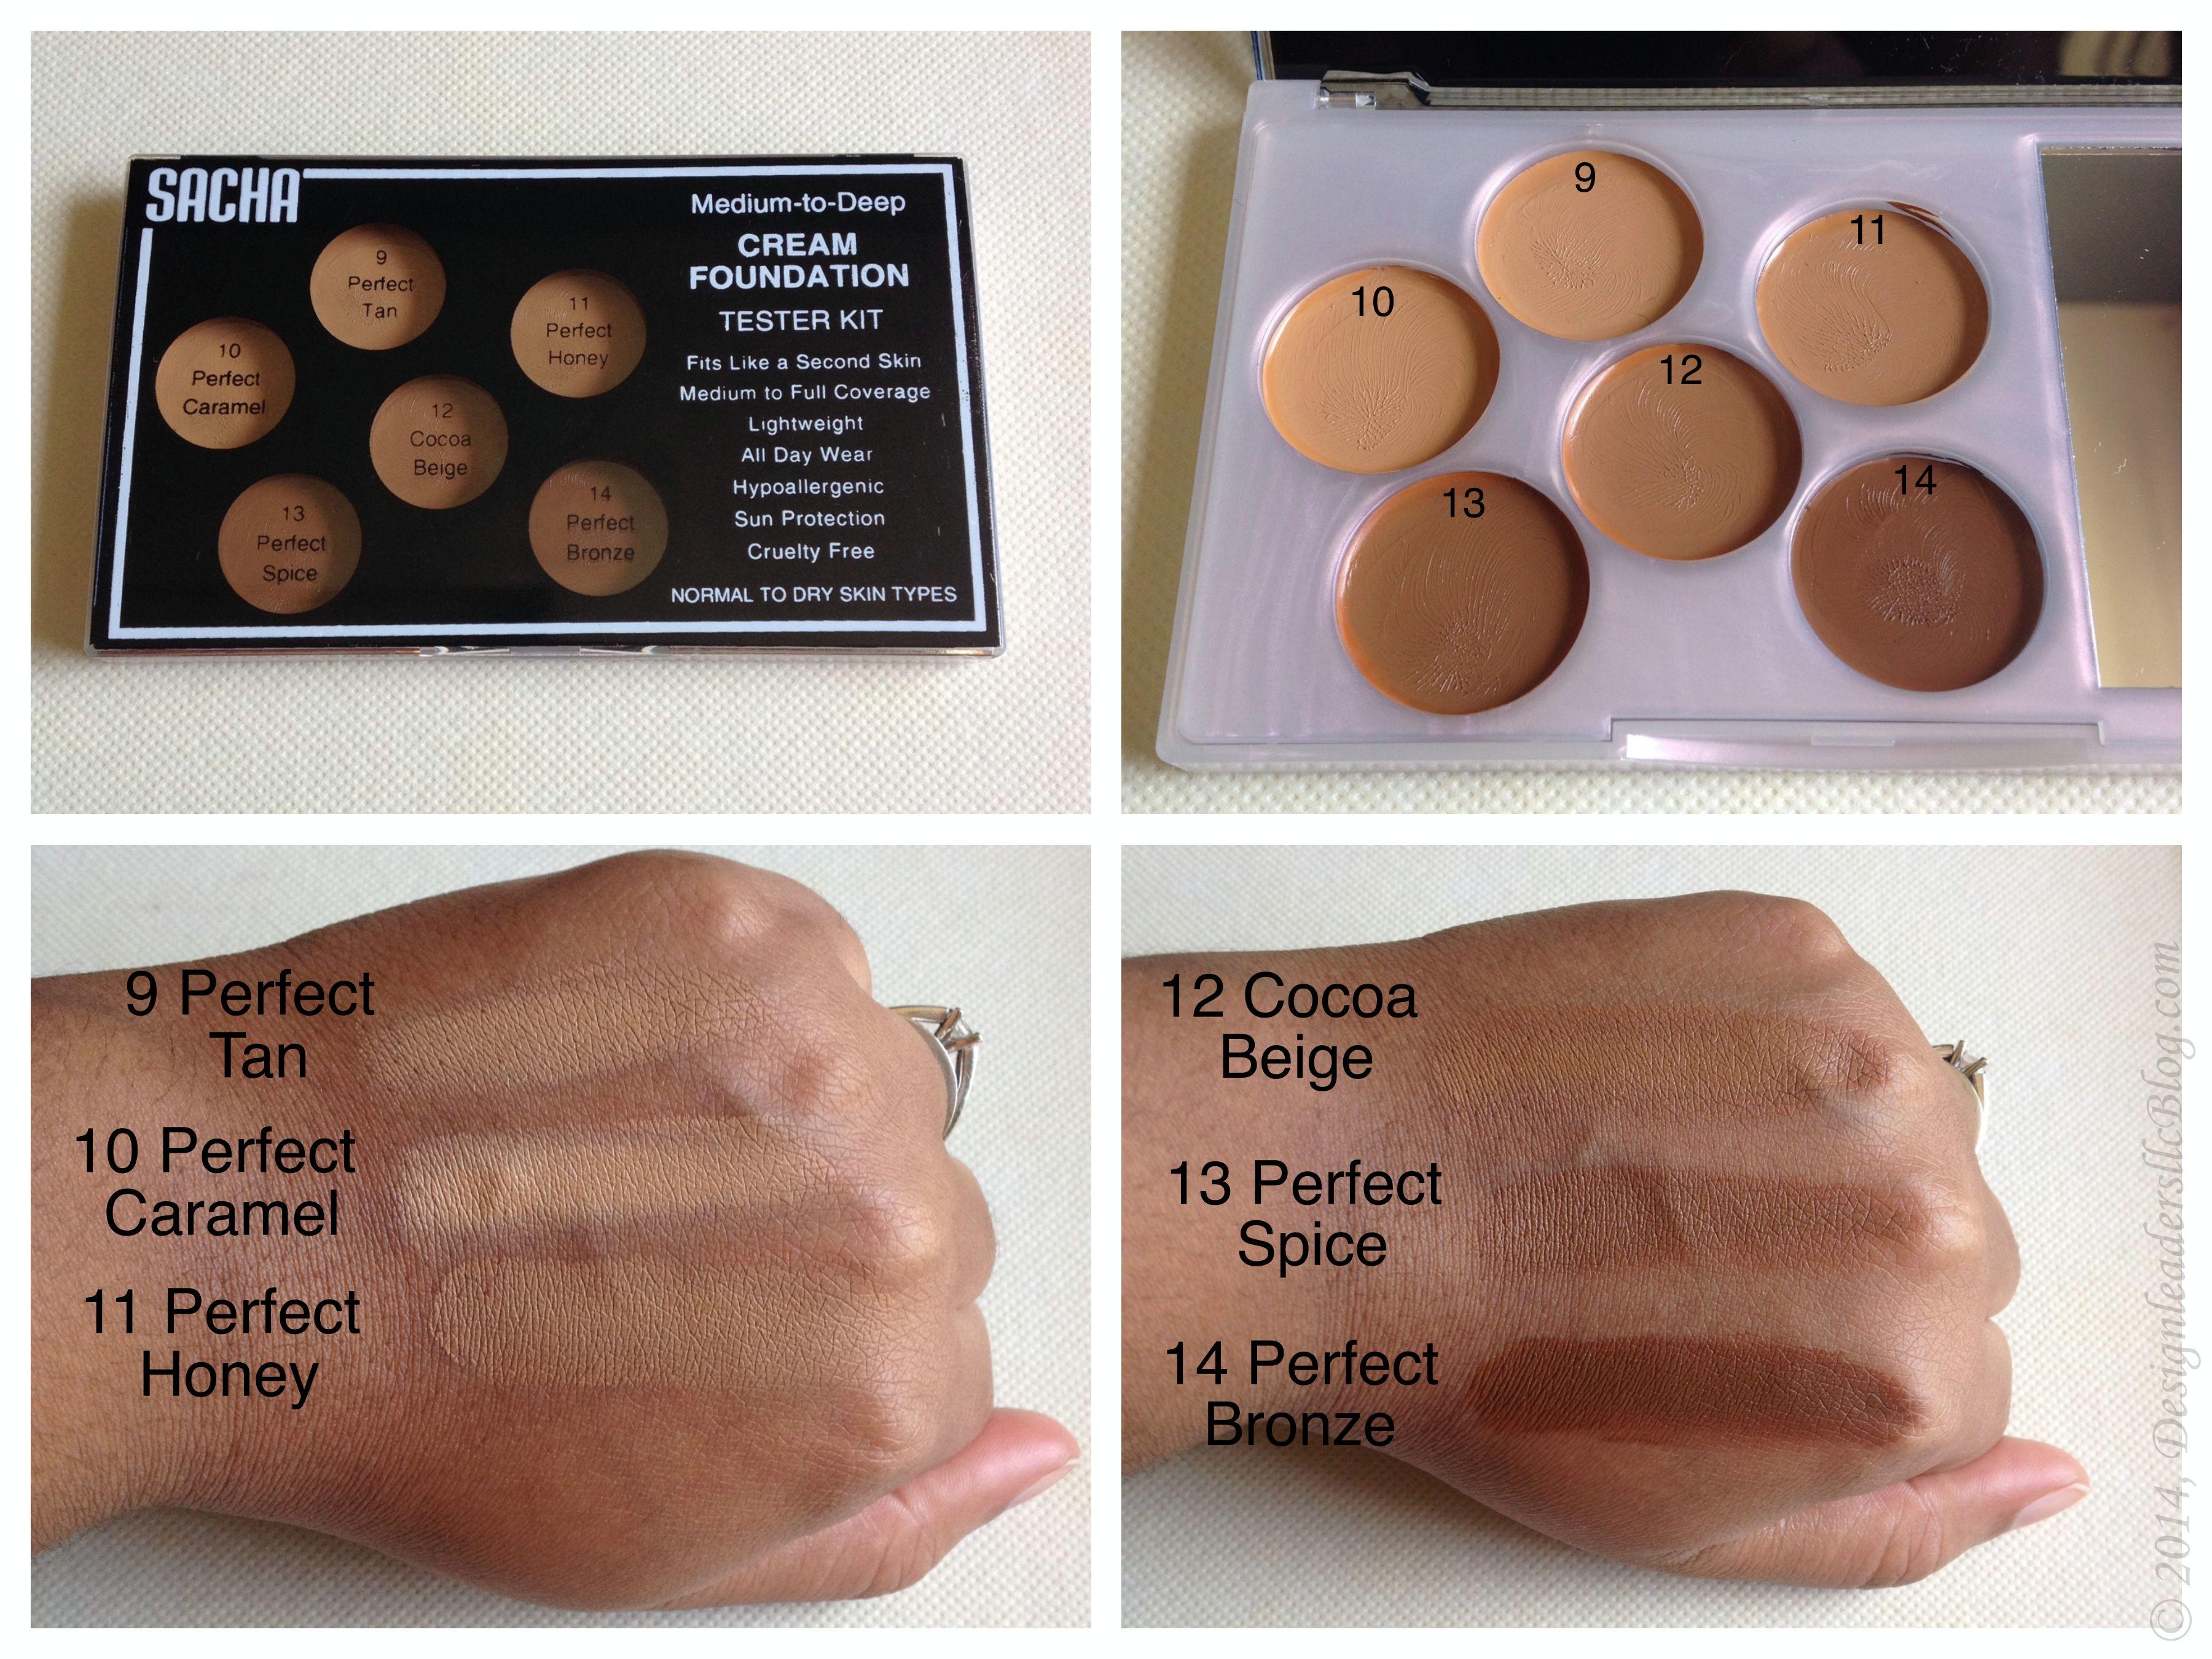 Sacha Cosmetics Cream Foundation Tester Kit (for tan